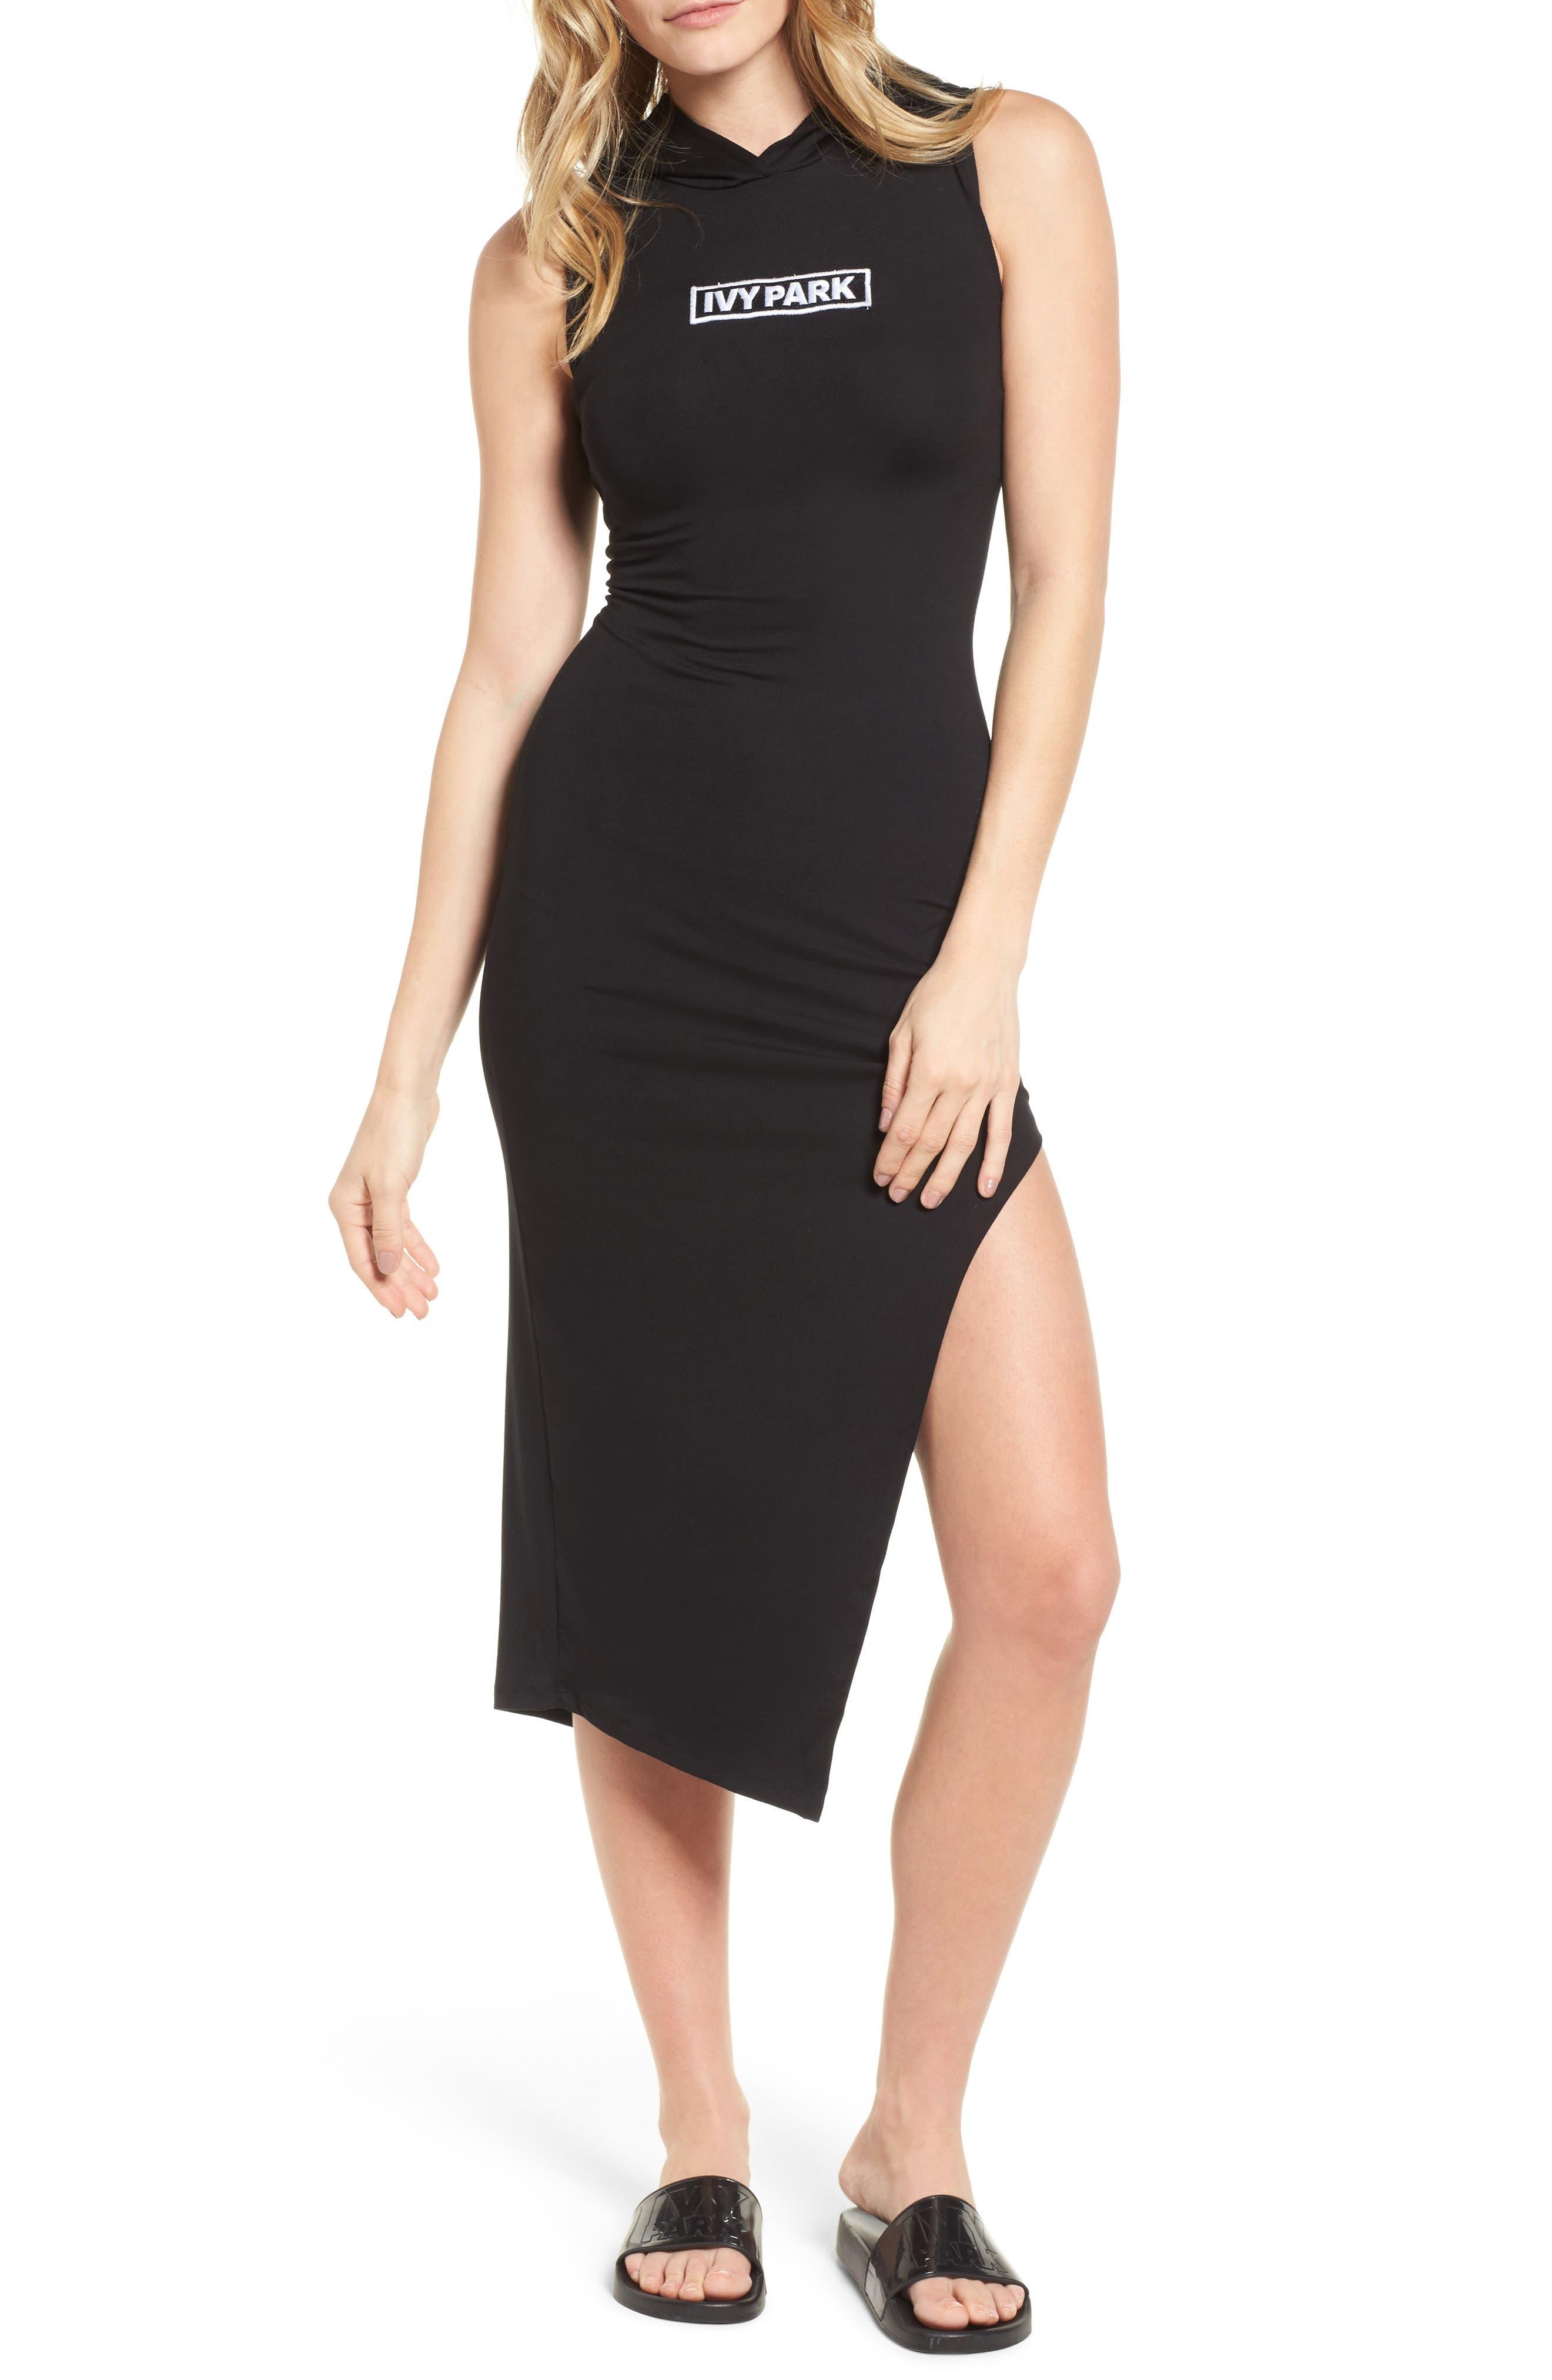 Alternate Image 1 Selected - IVY PARK® Lace-Up Back Hooded Dress